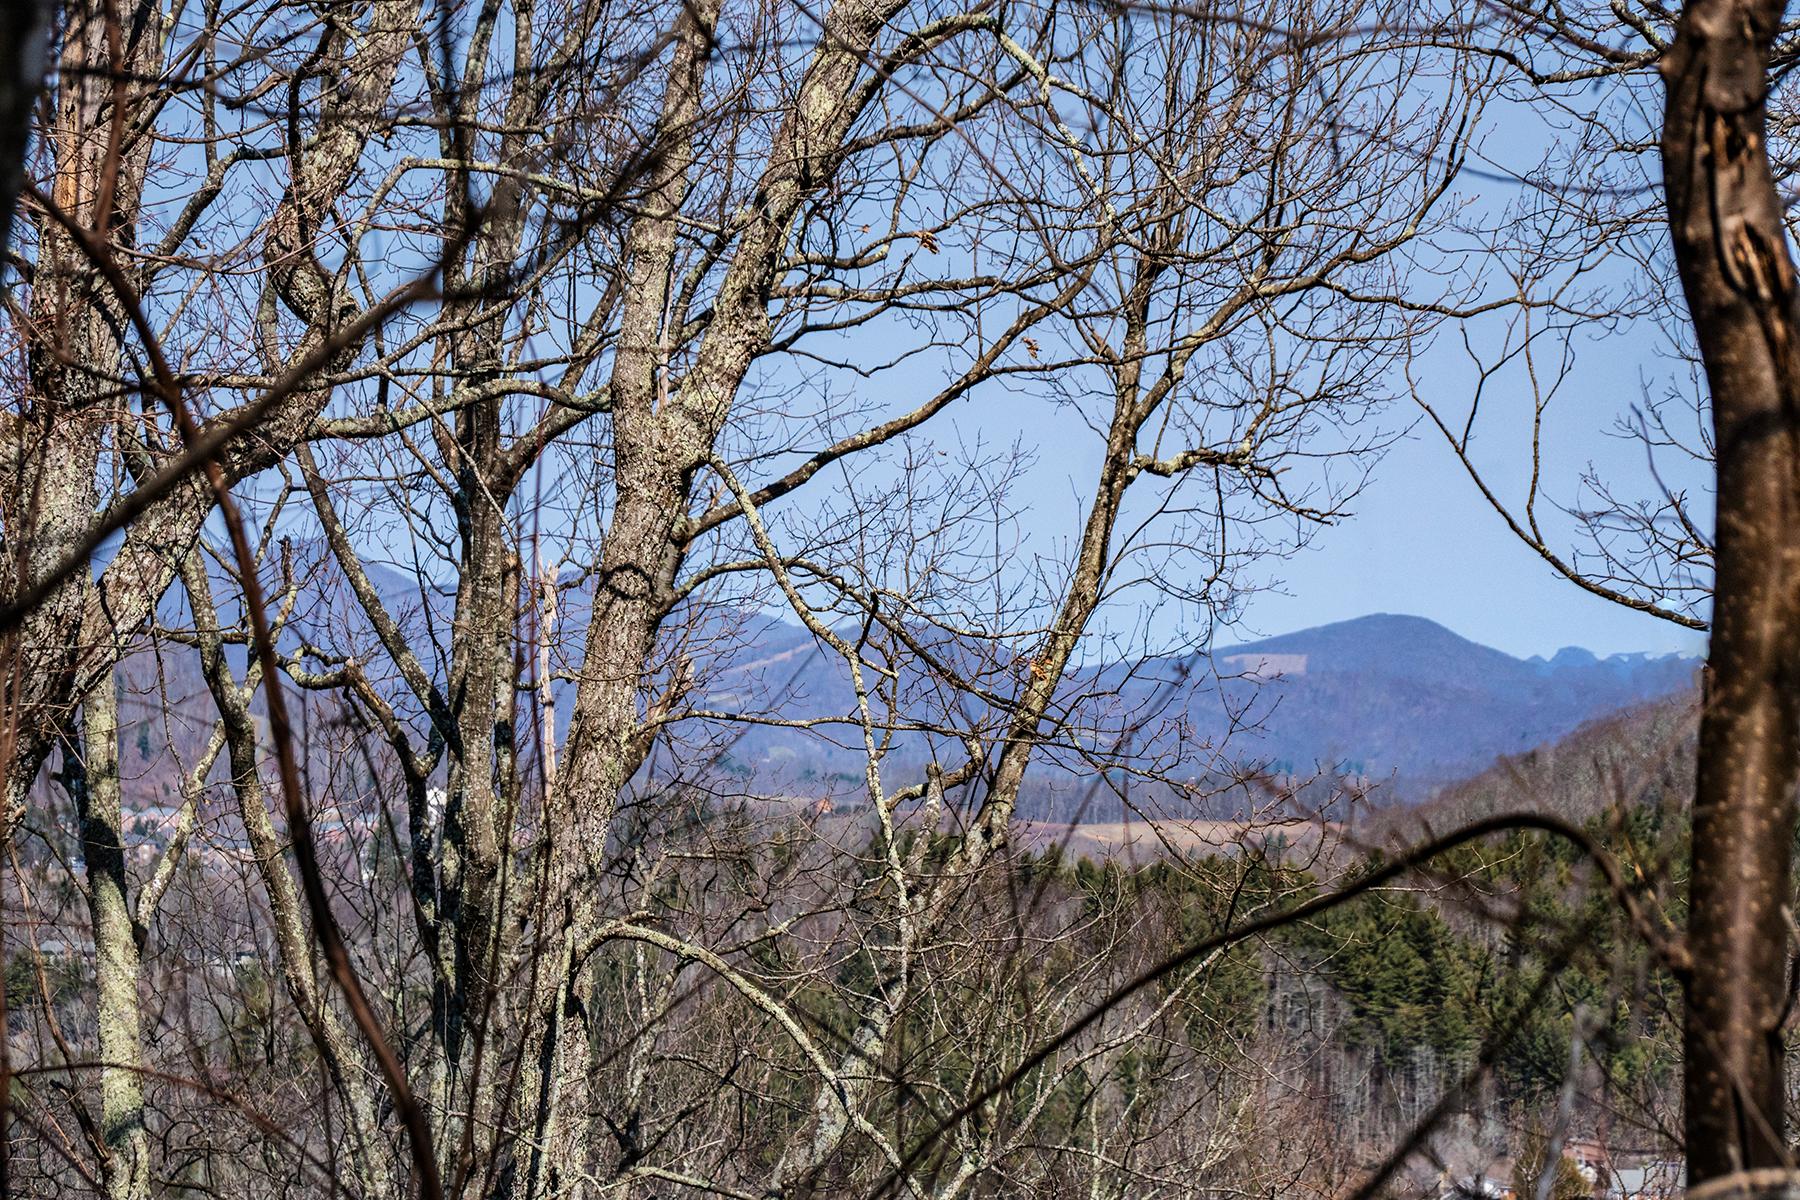 Land for Sale at BOONE Tbd Eagle, Boone, North Carolina, 28607 United States